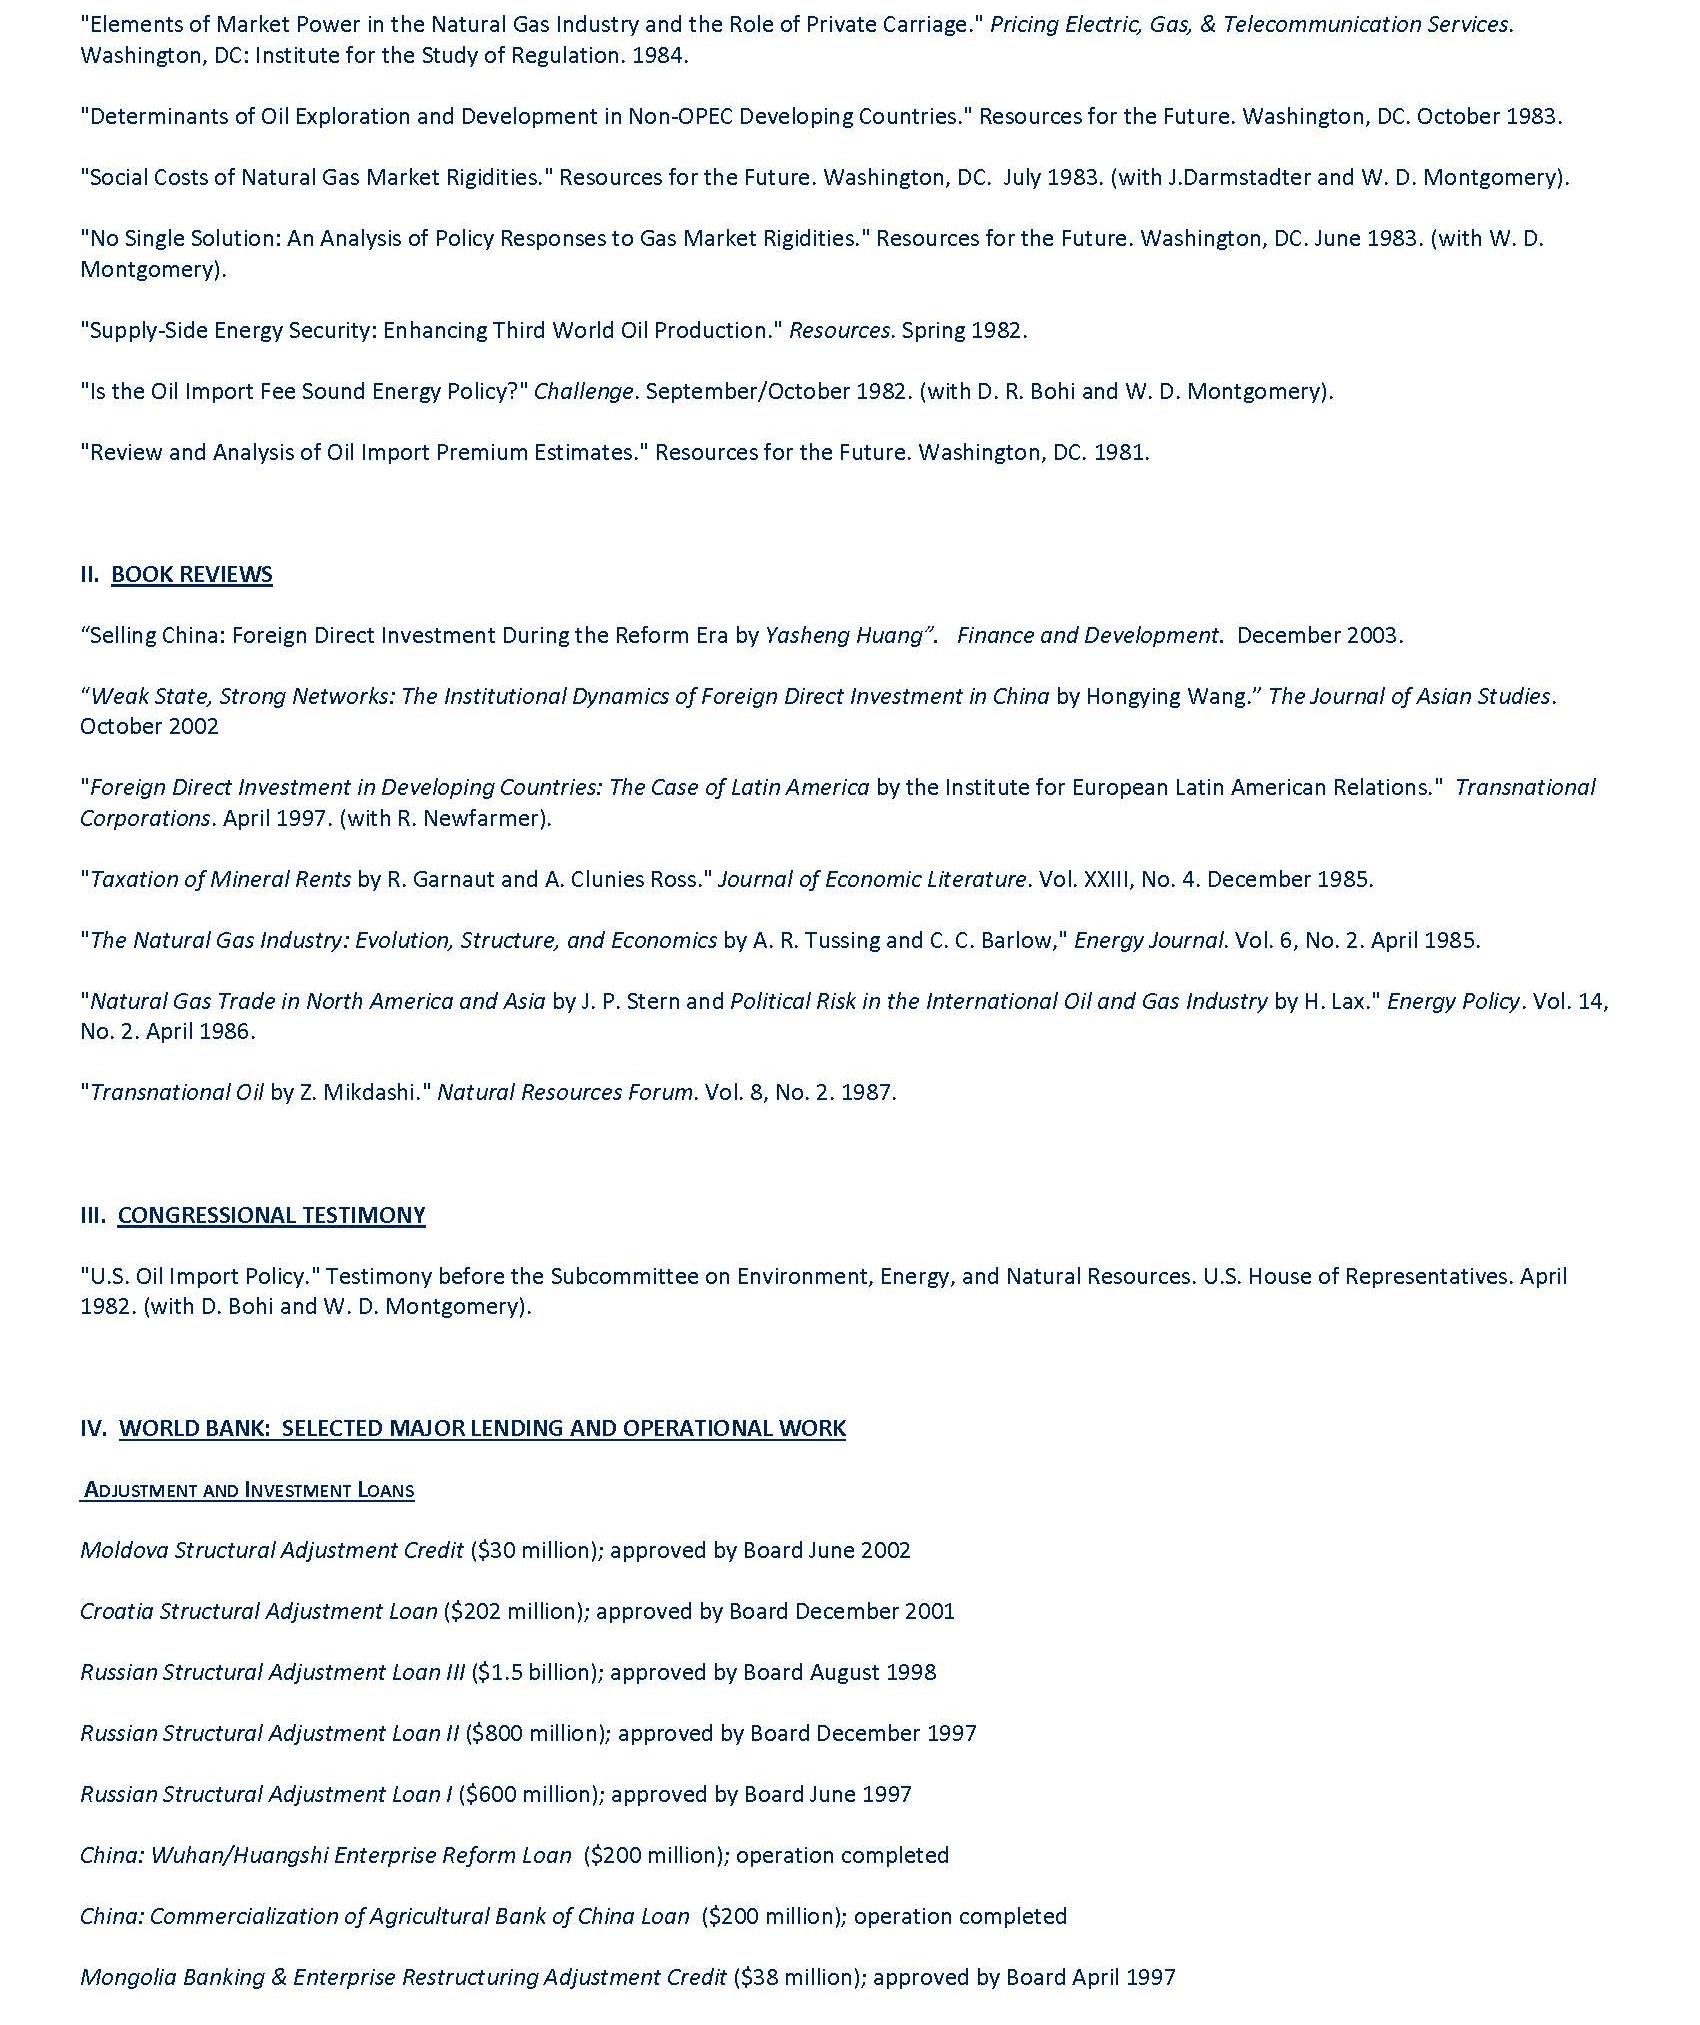 Harry Broadman Ac Full wGM 8-17-18_Page_7.jpg